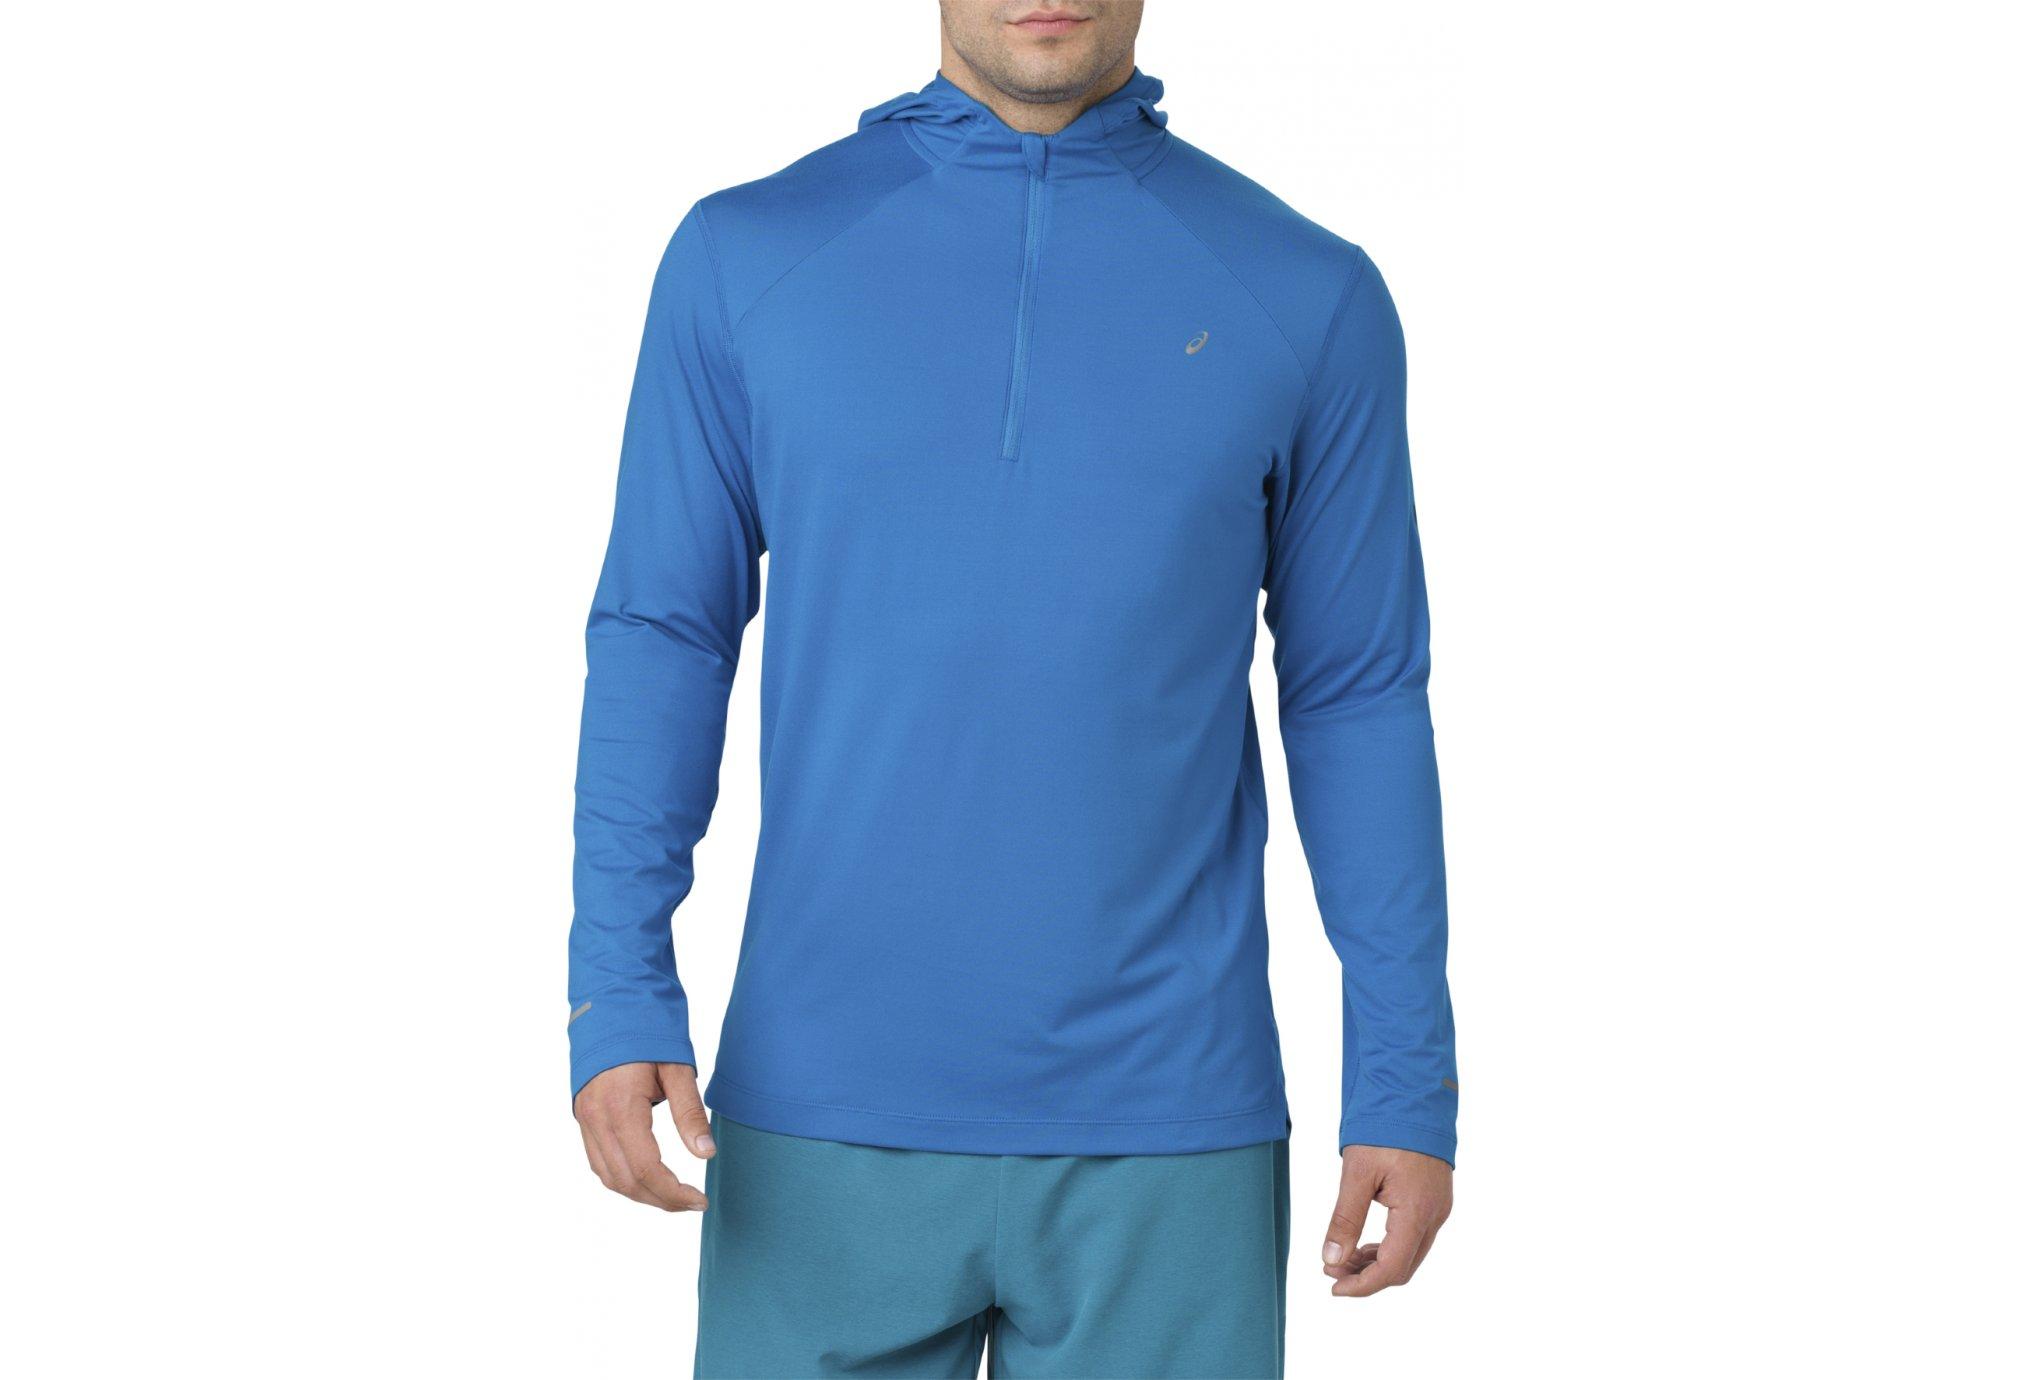 La Fortifiée - Asics LS Hoodie M vêtement running homme 37d371ac8f7d